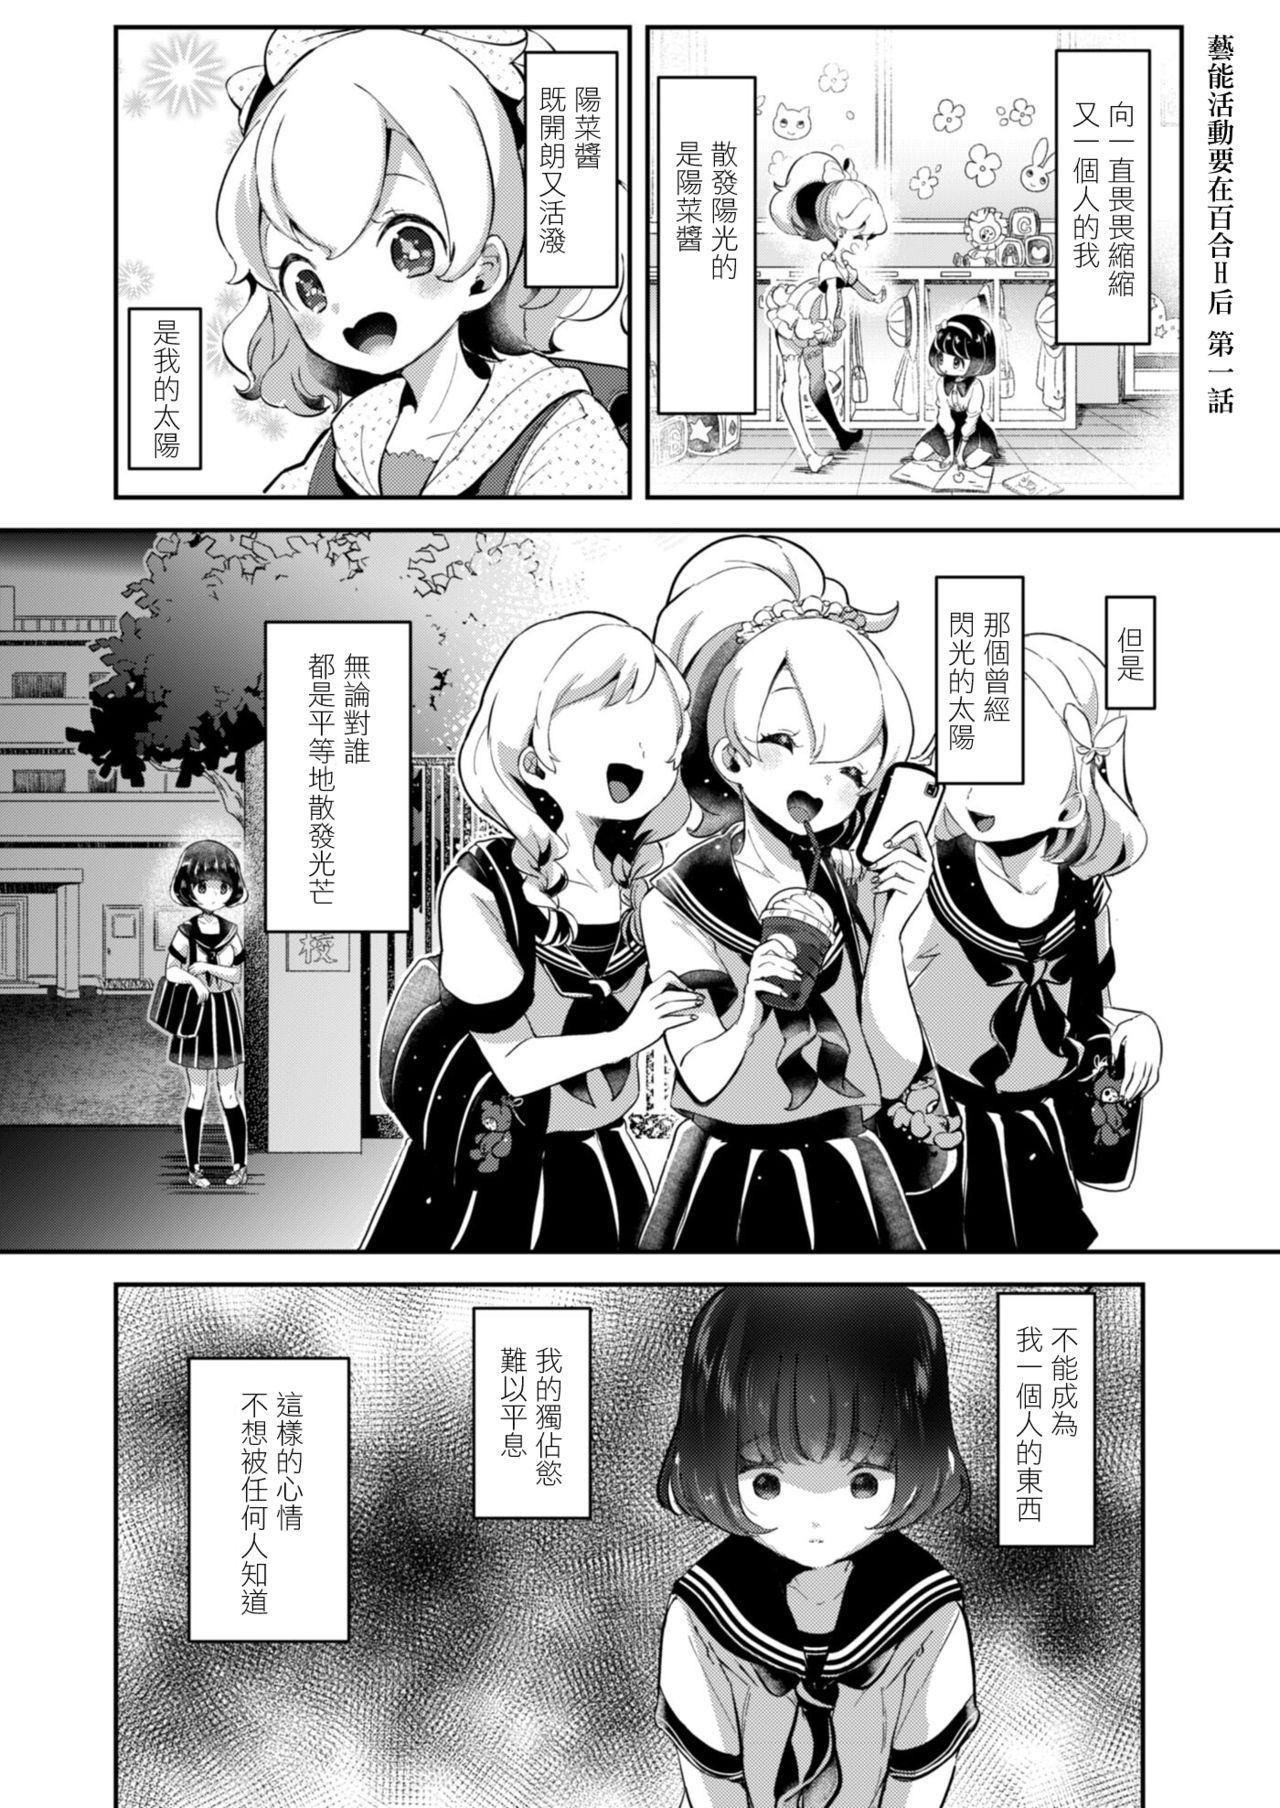 [Cyori Mokki] Geinou  Katsudou wa Yuri Ecchi no atode ch.1-3 丨藝能活動要在百合H後 第1-2話  [Chinese] [沒有漢化] [Digital] 1